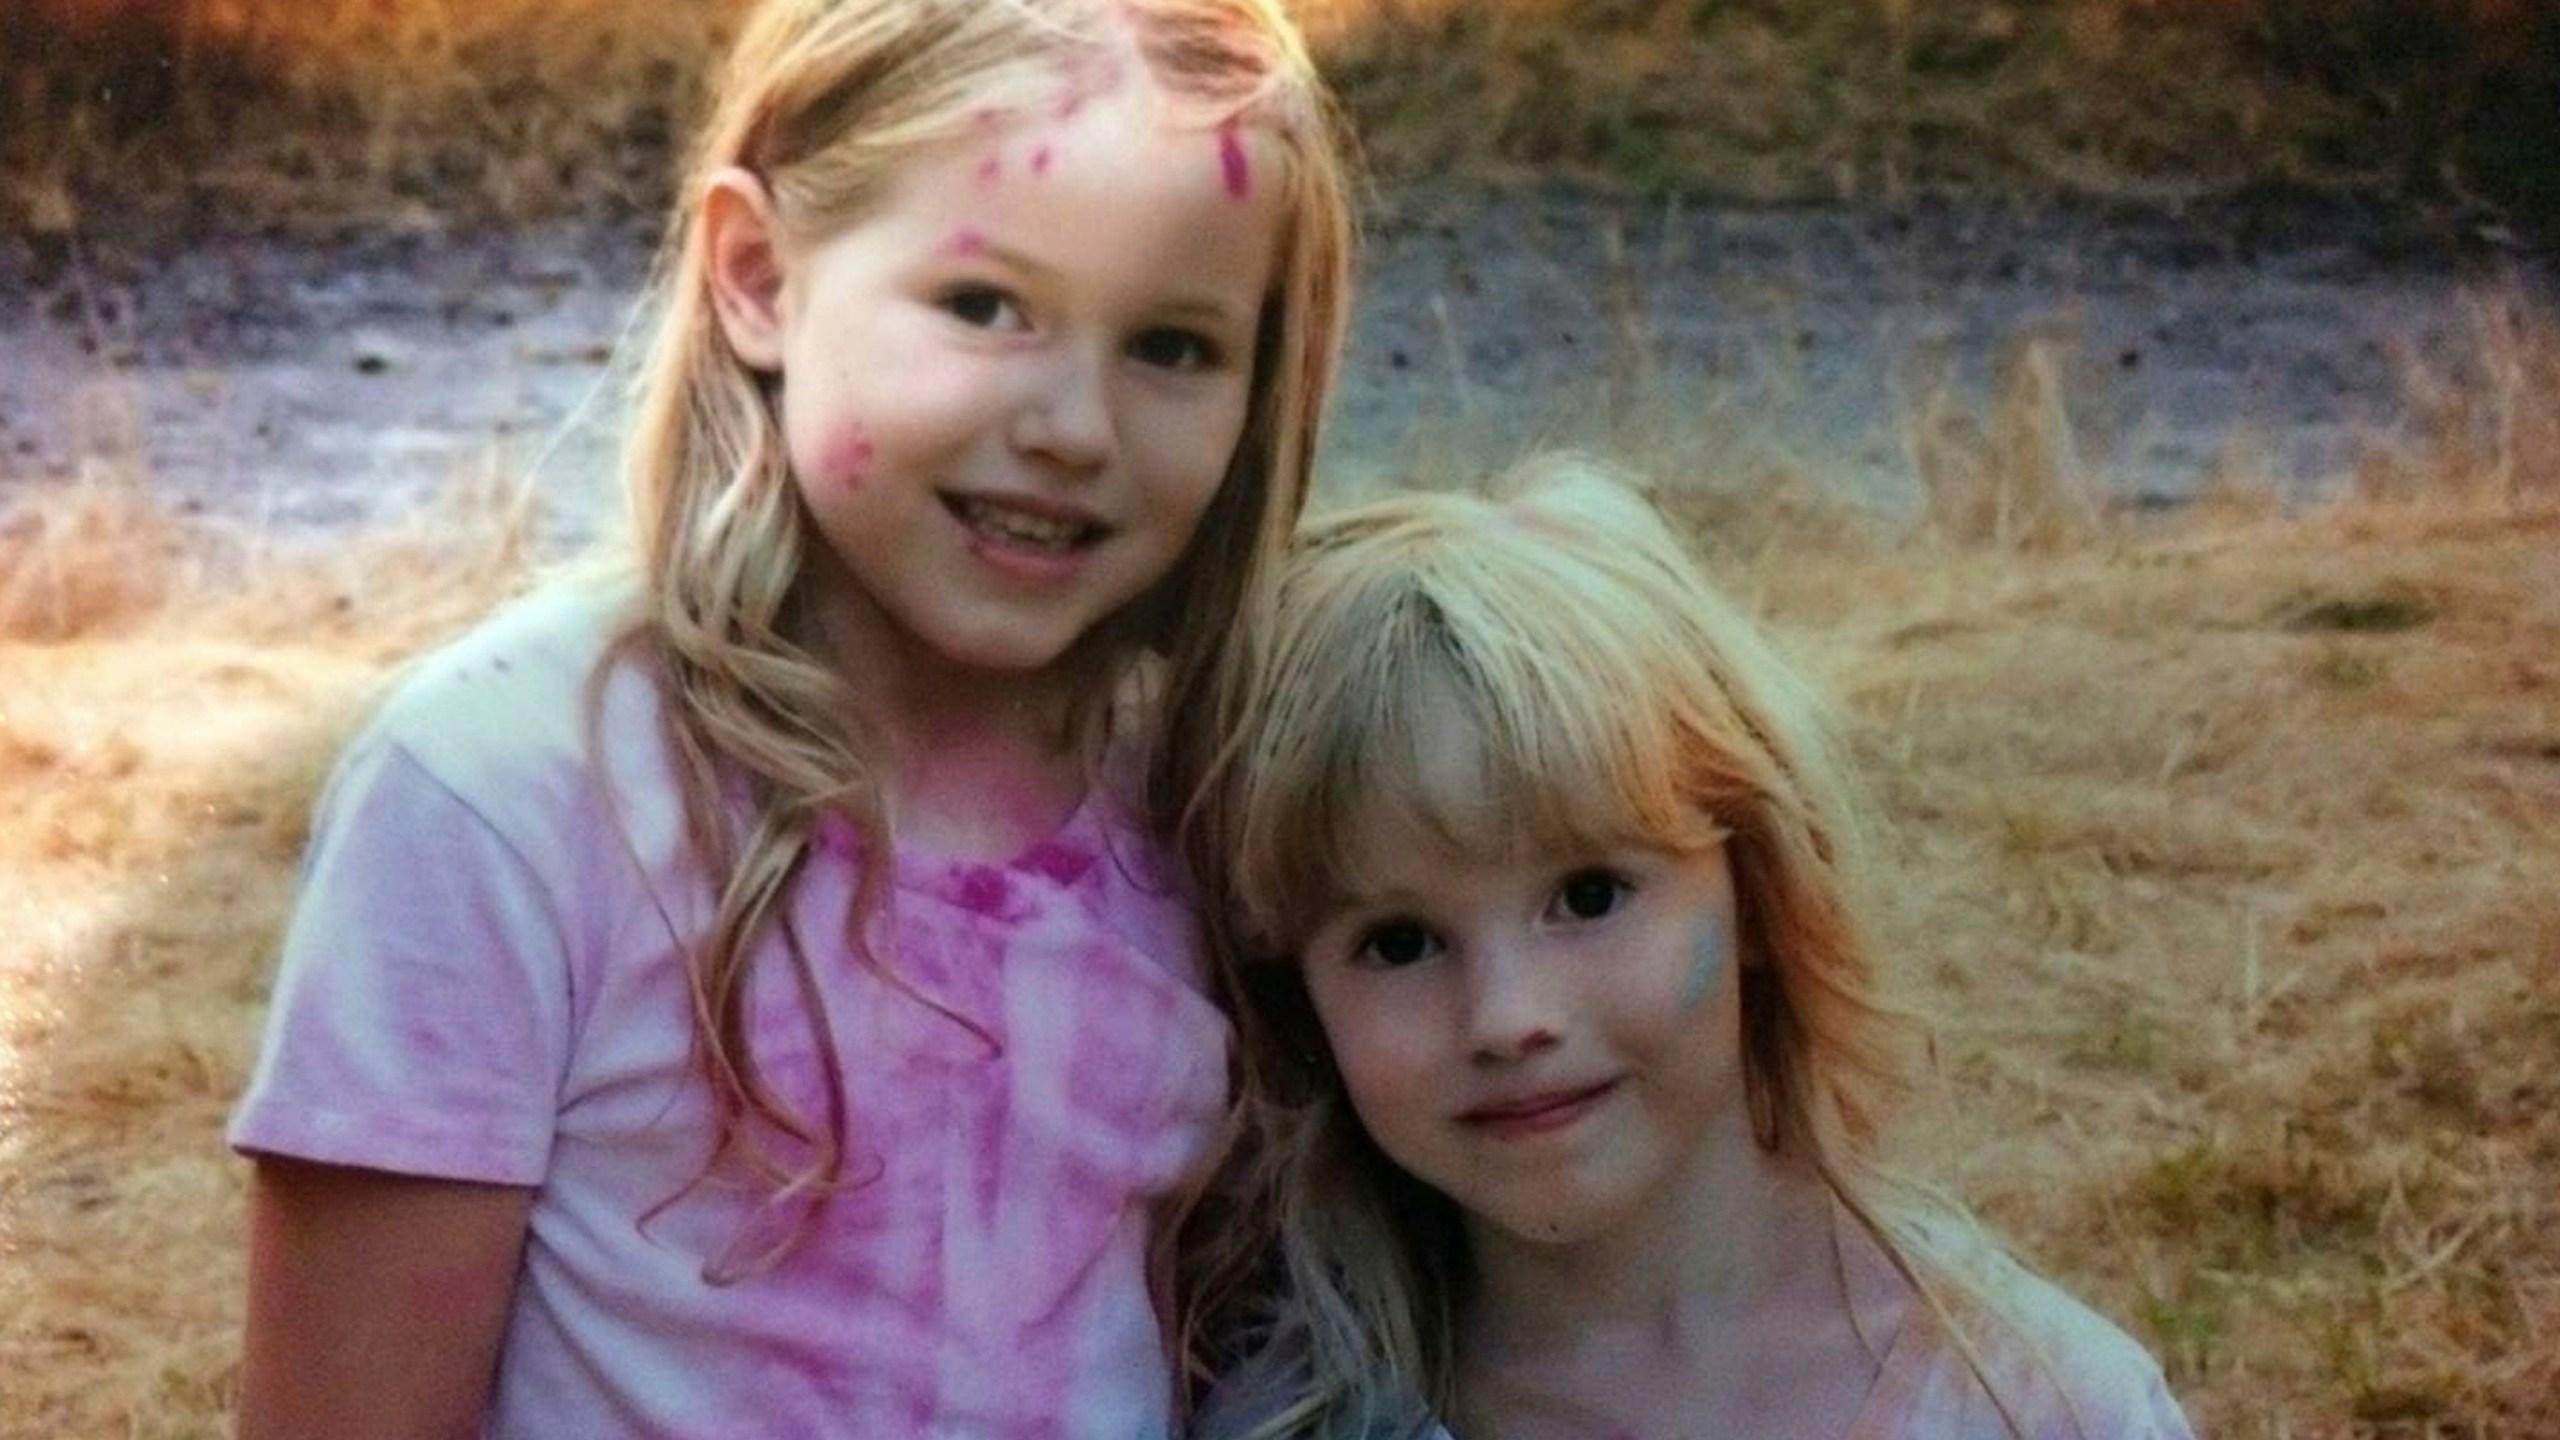 Missing Sisters_1551655169350